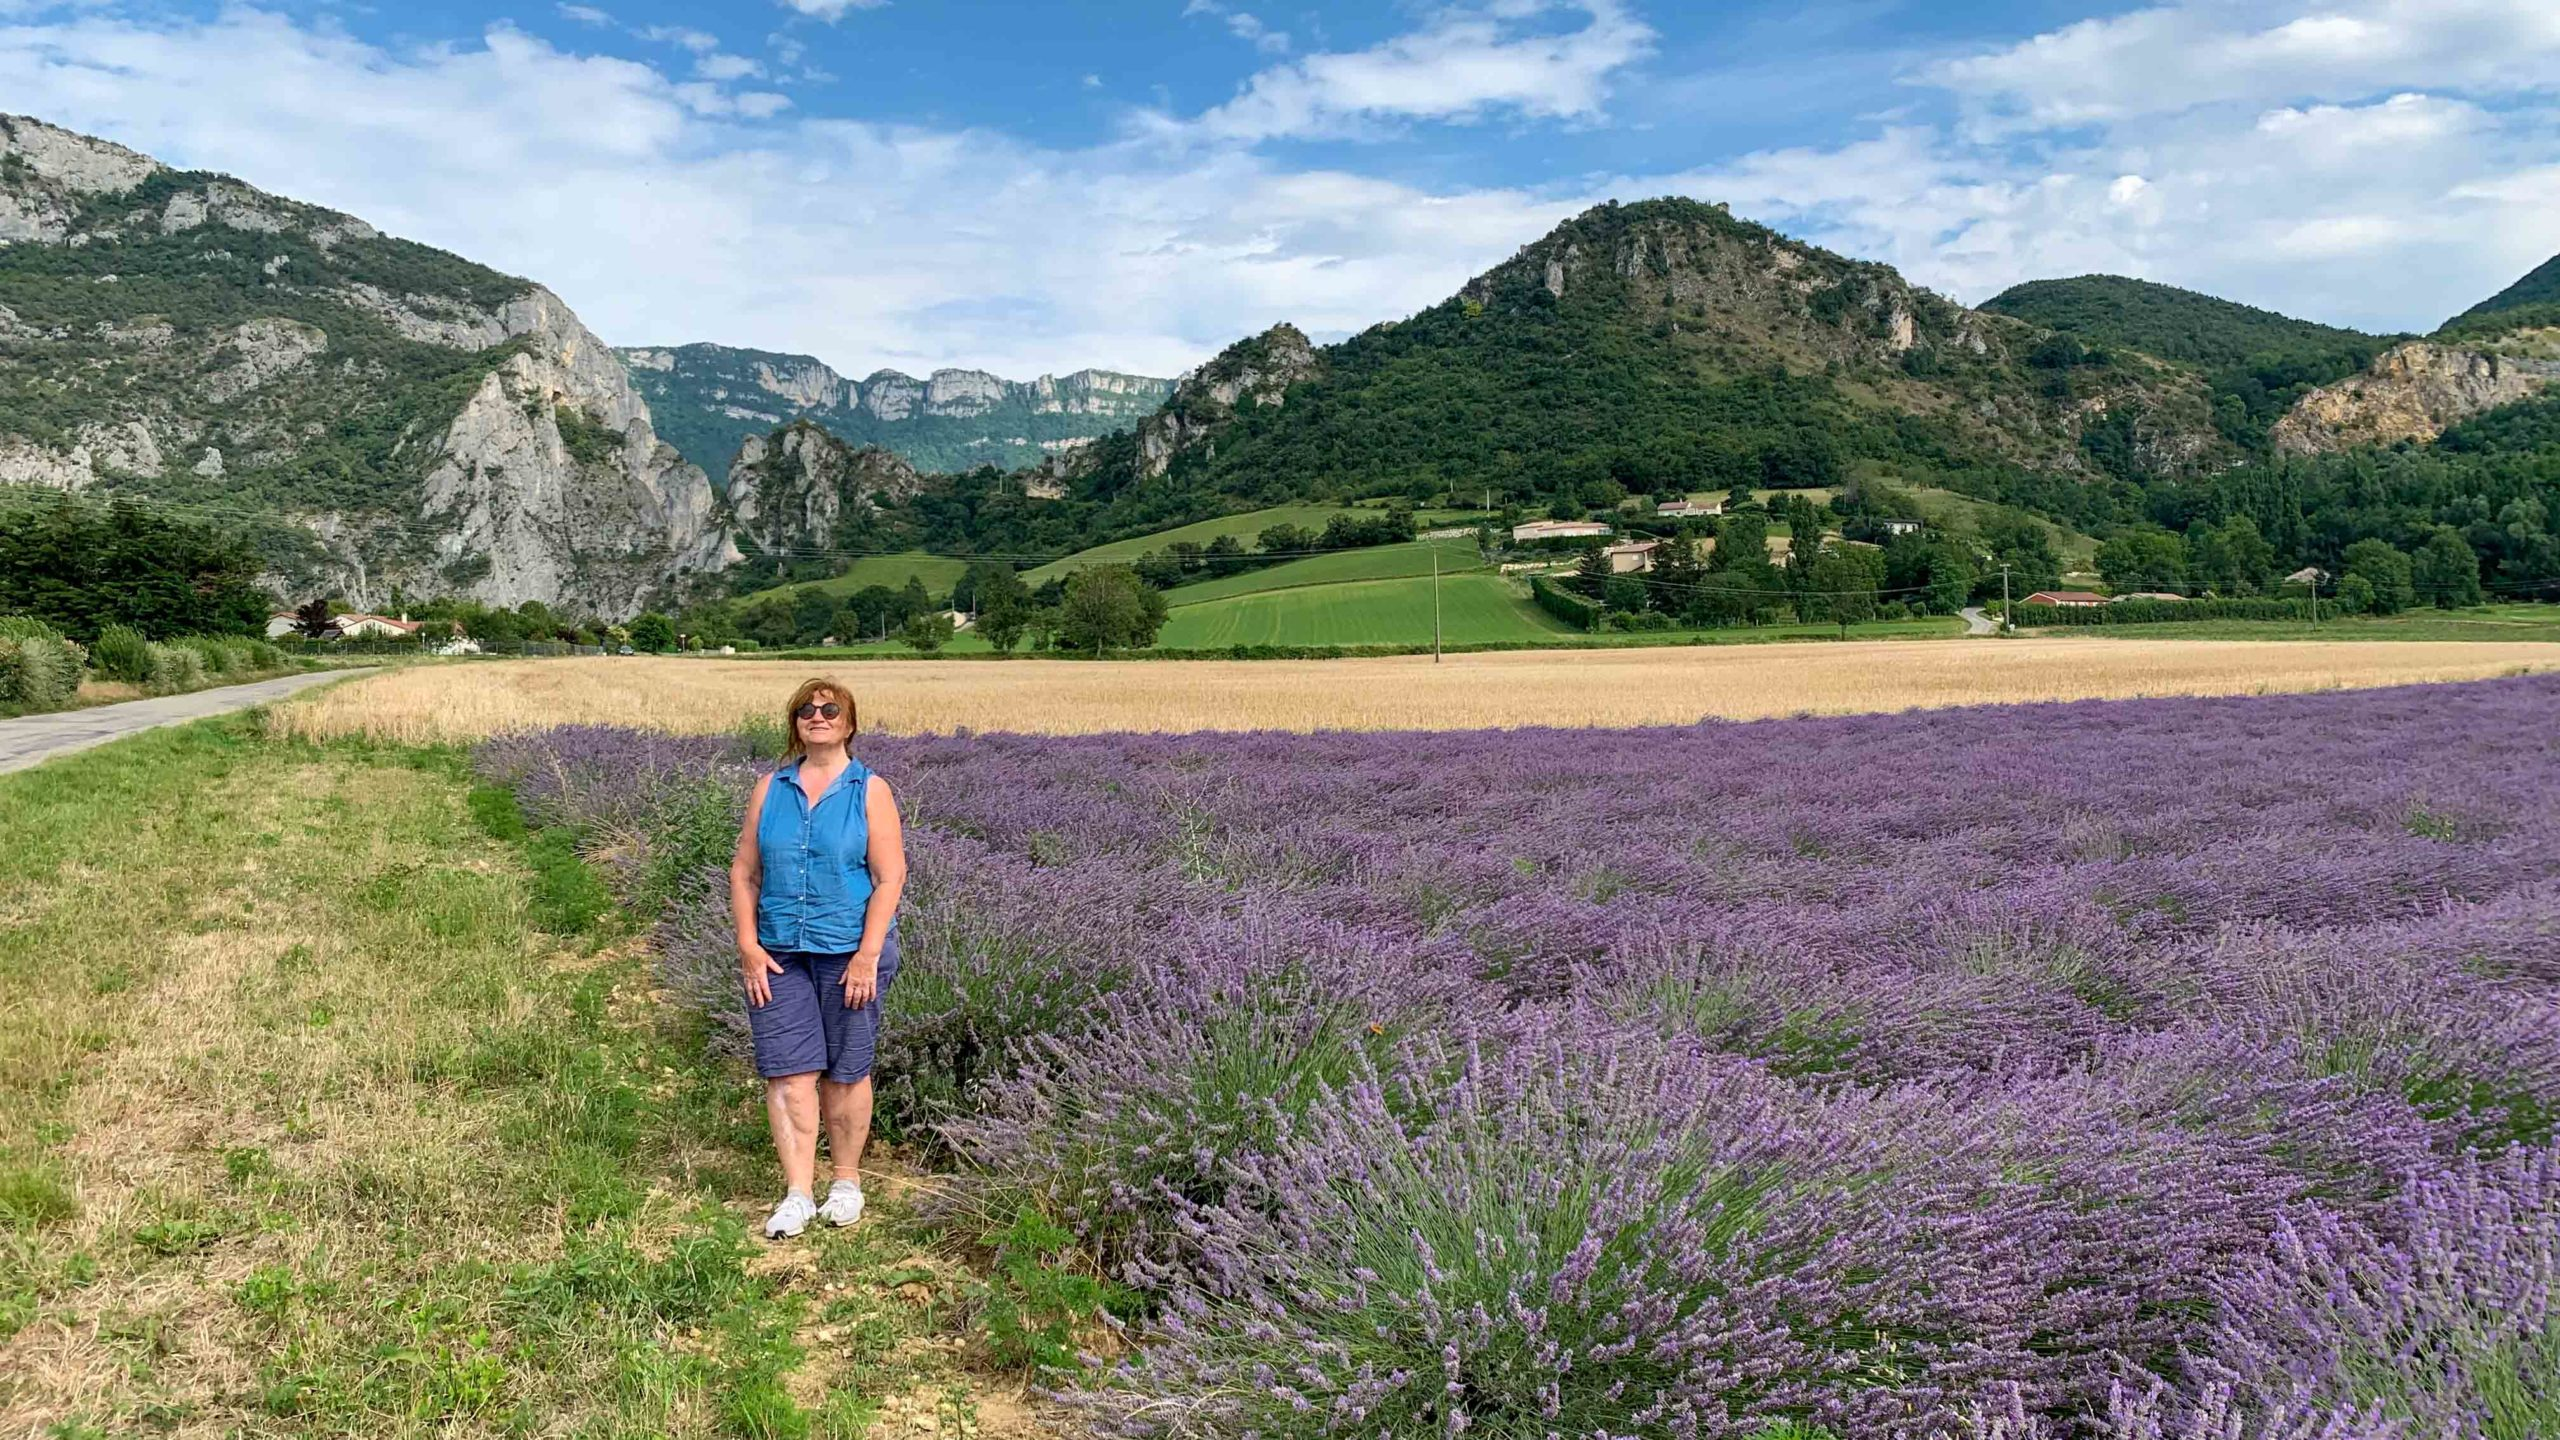 Walk in nature. Rochefort-Samson in France.